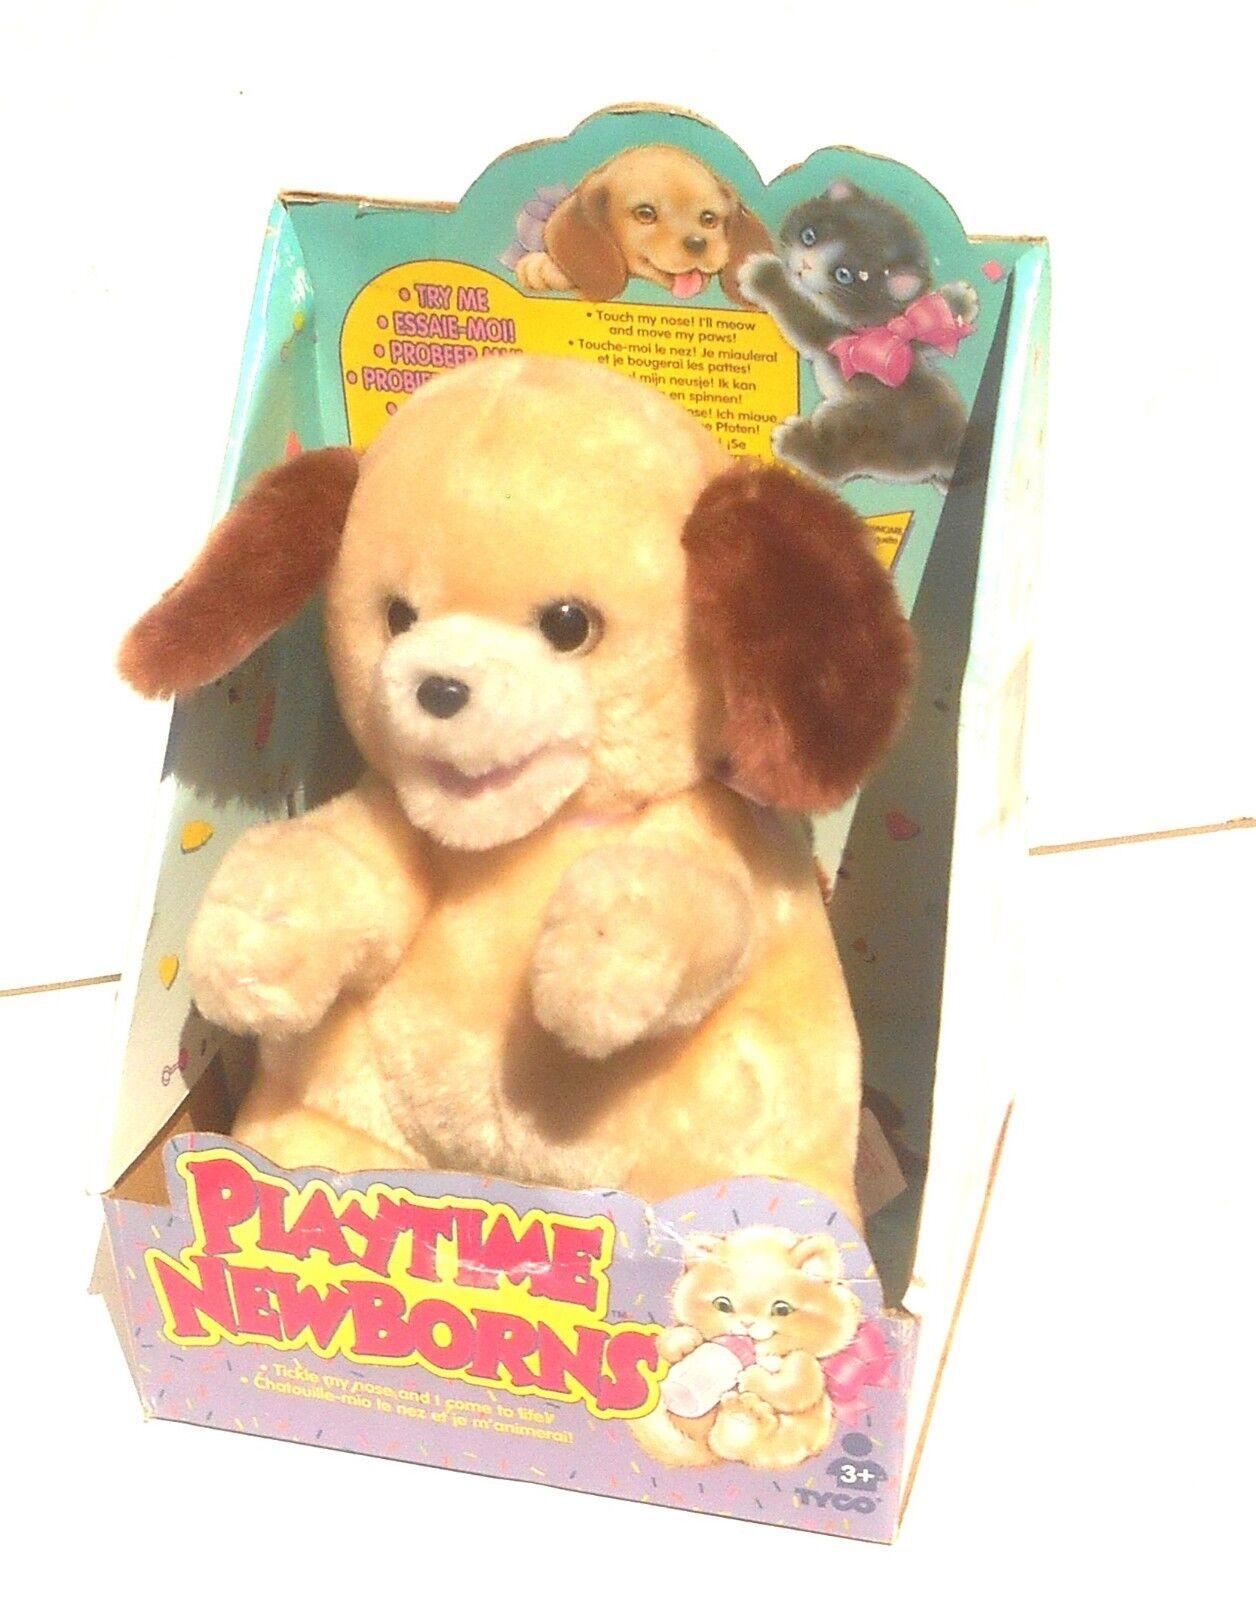 1995 Tyco Industries Inc  Playtime Newborns  PUPPY  8